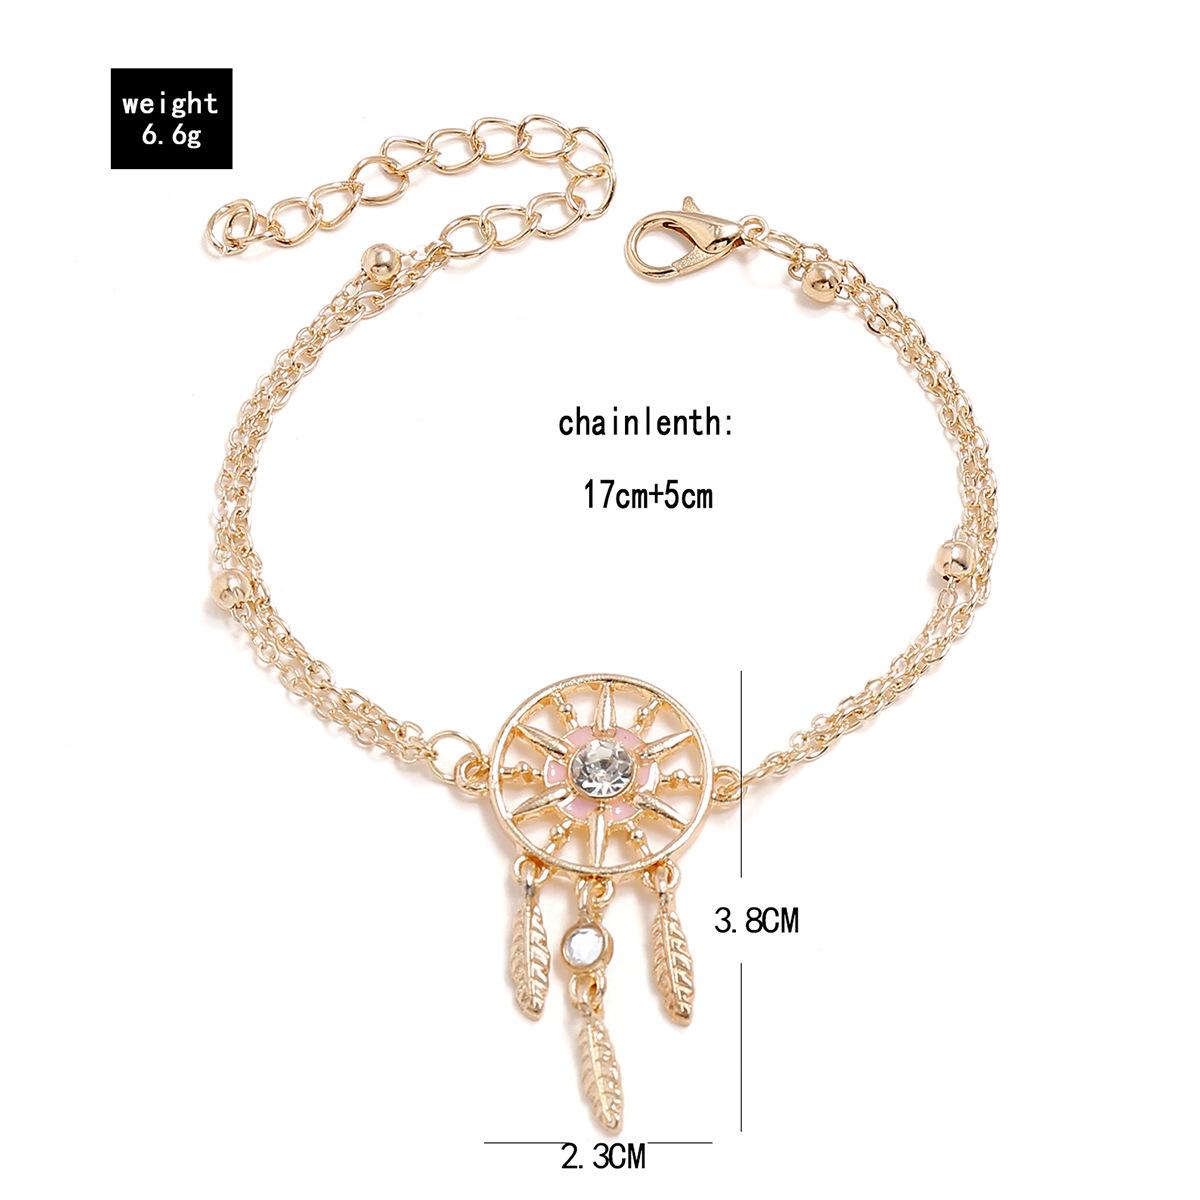 Bohemian oil tassel rhinestone dreamcatcher leaf bracelet for women NHPV205118